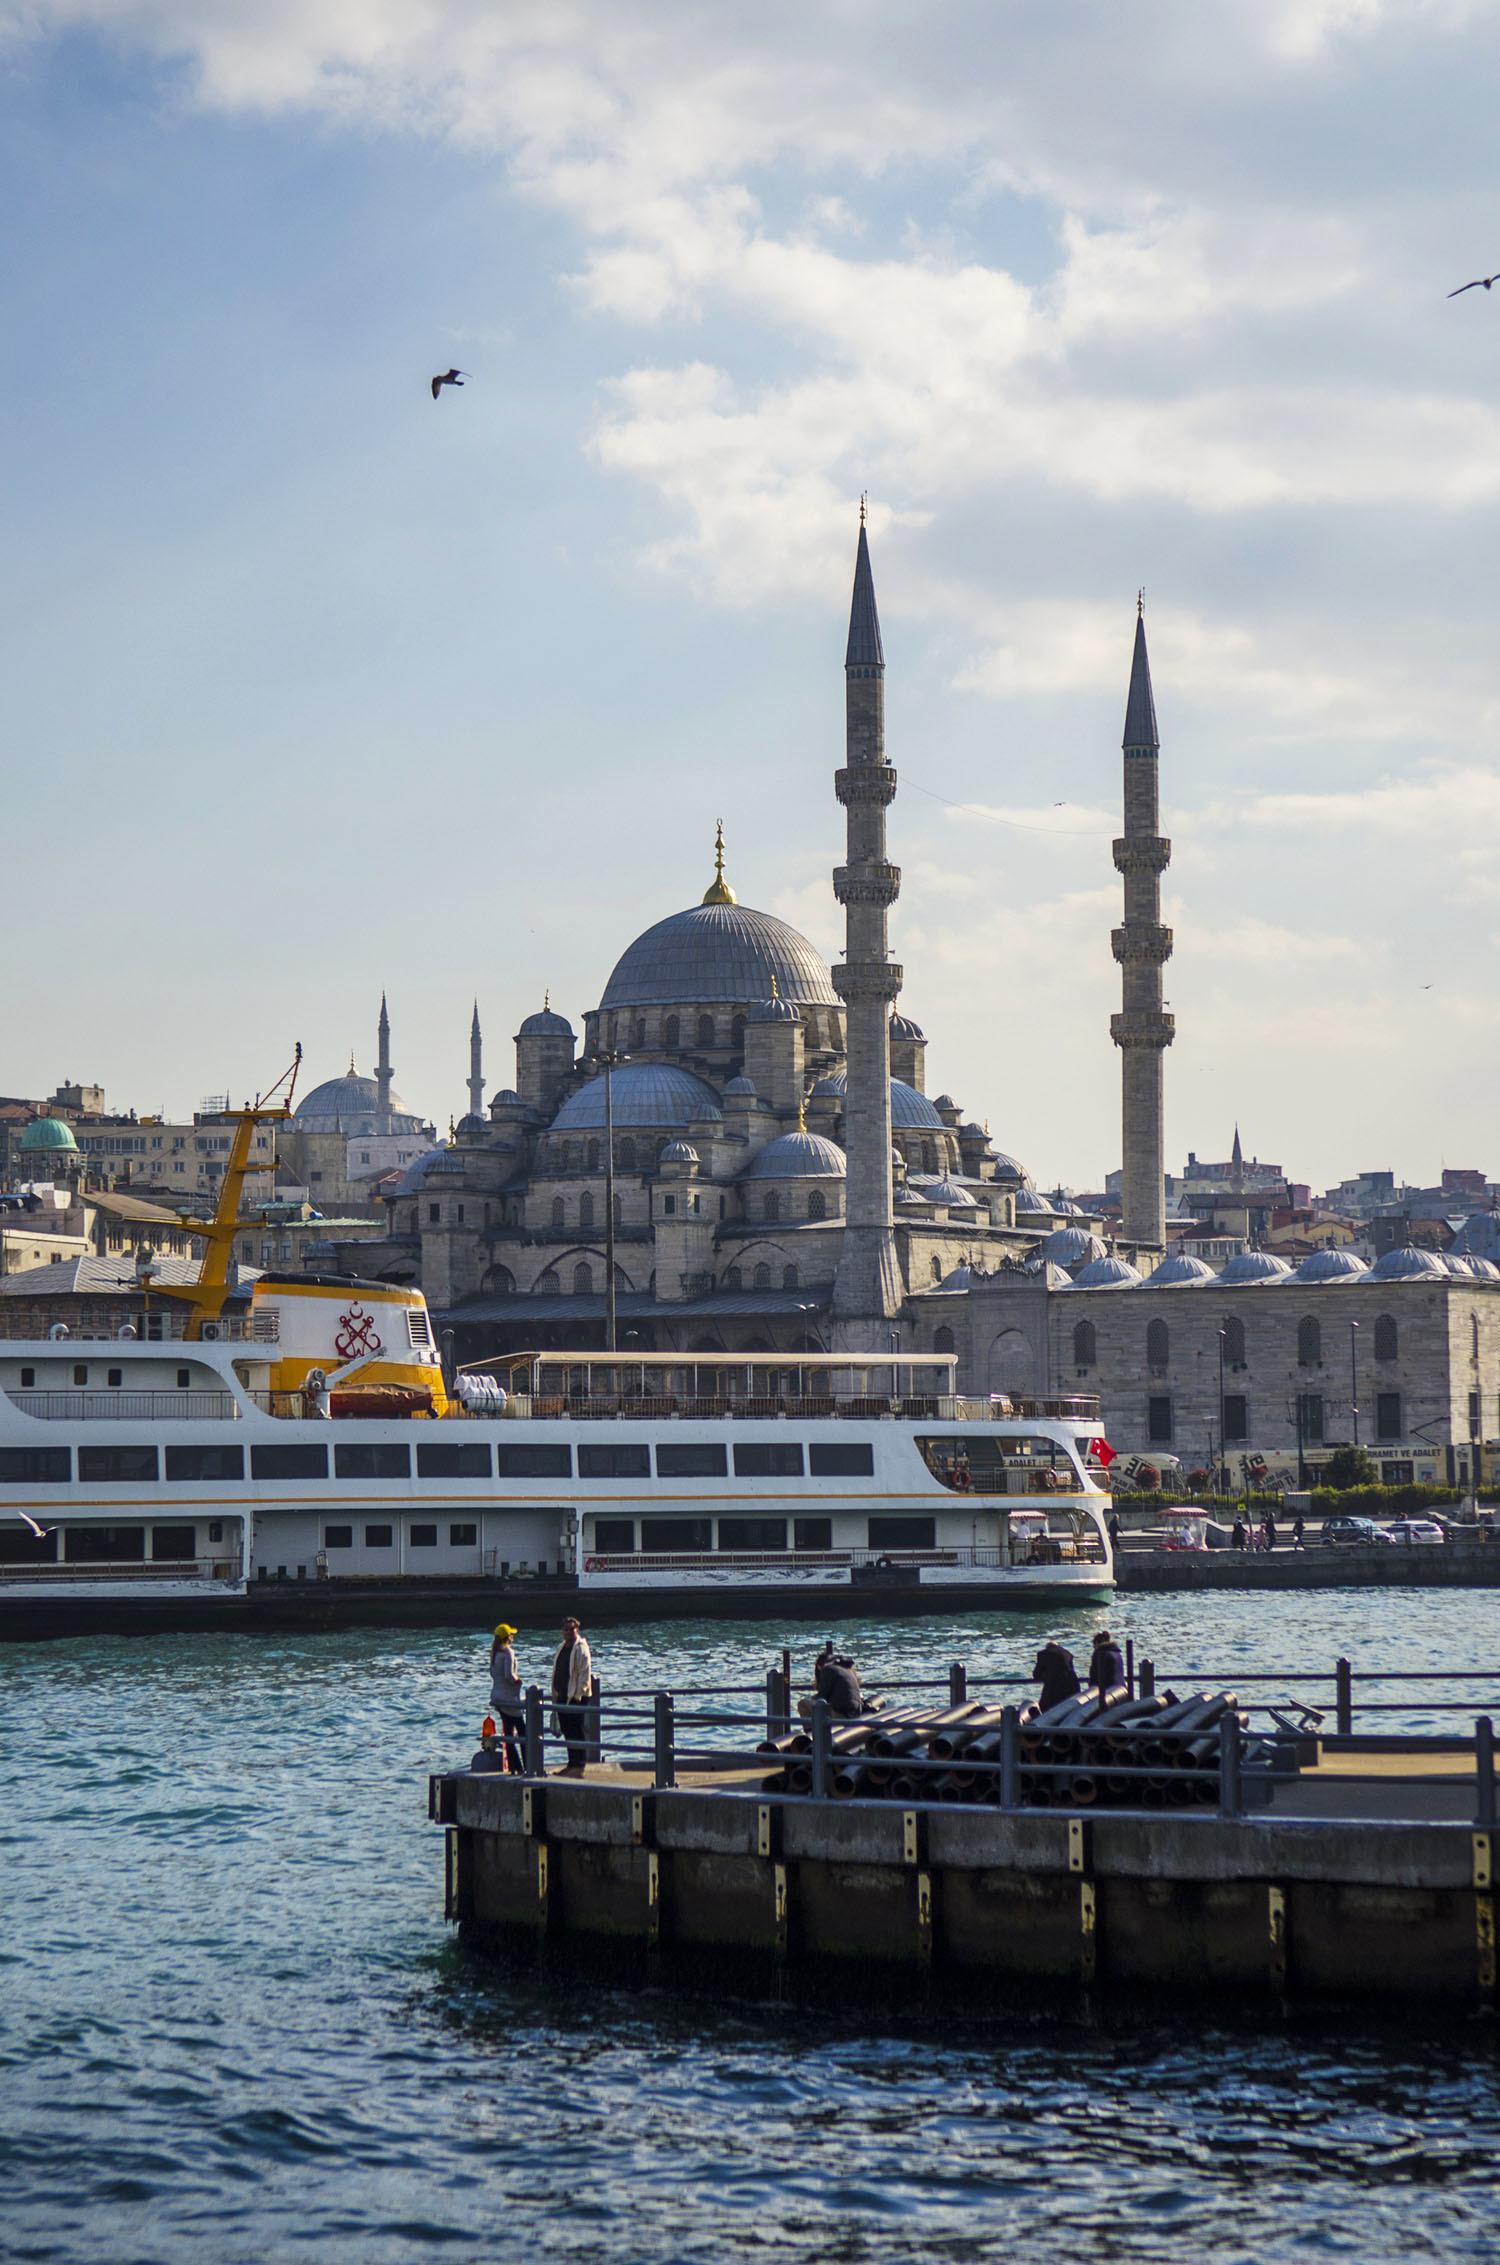 The Suleymaniye mosque as seen from Galata Bridge.